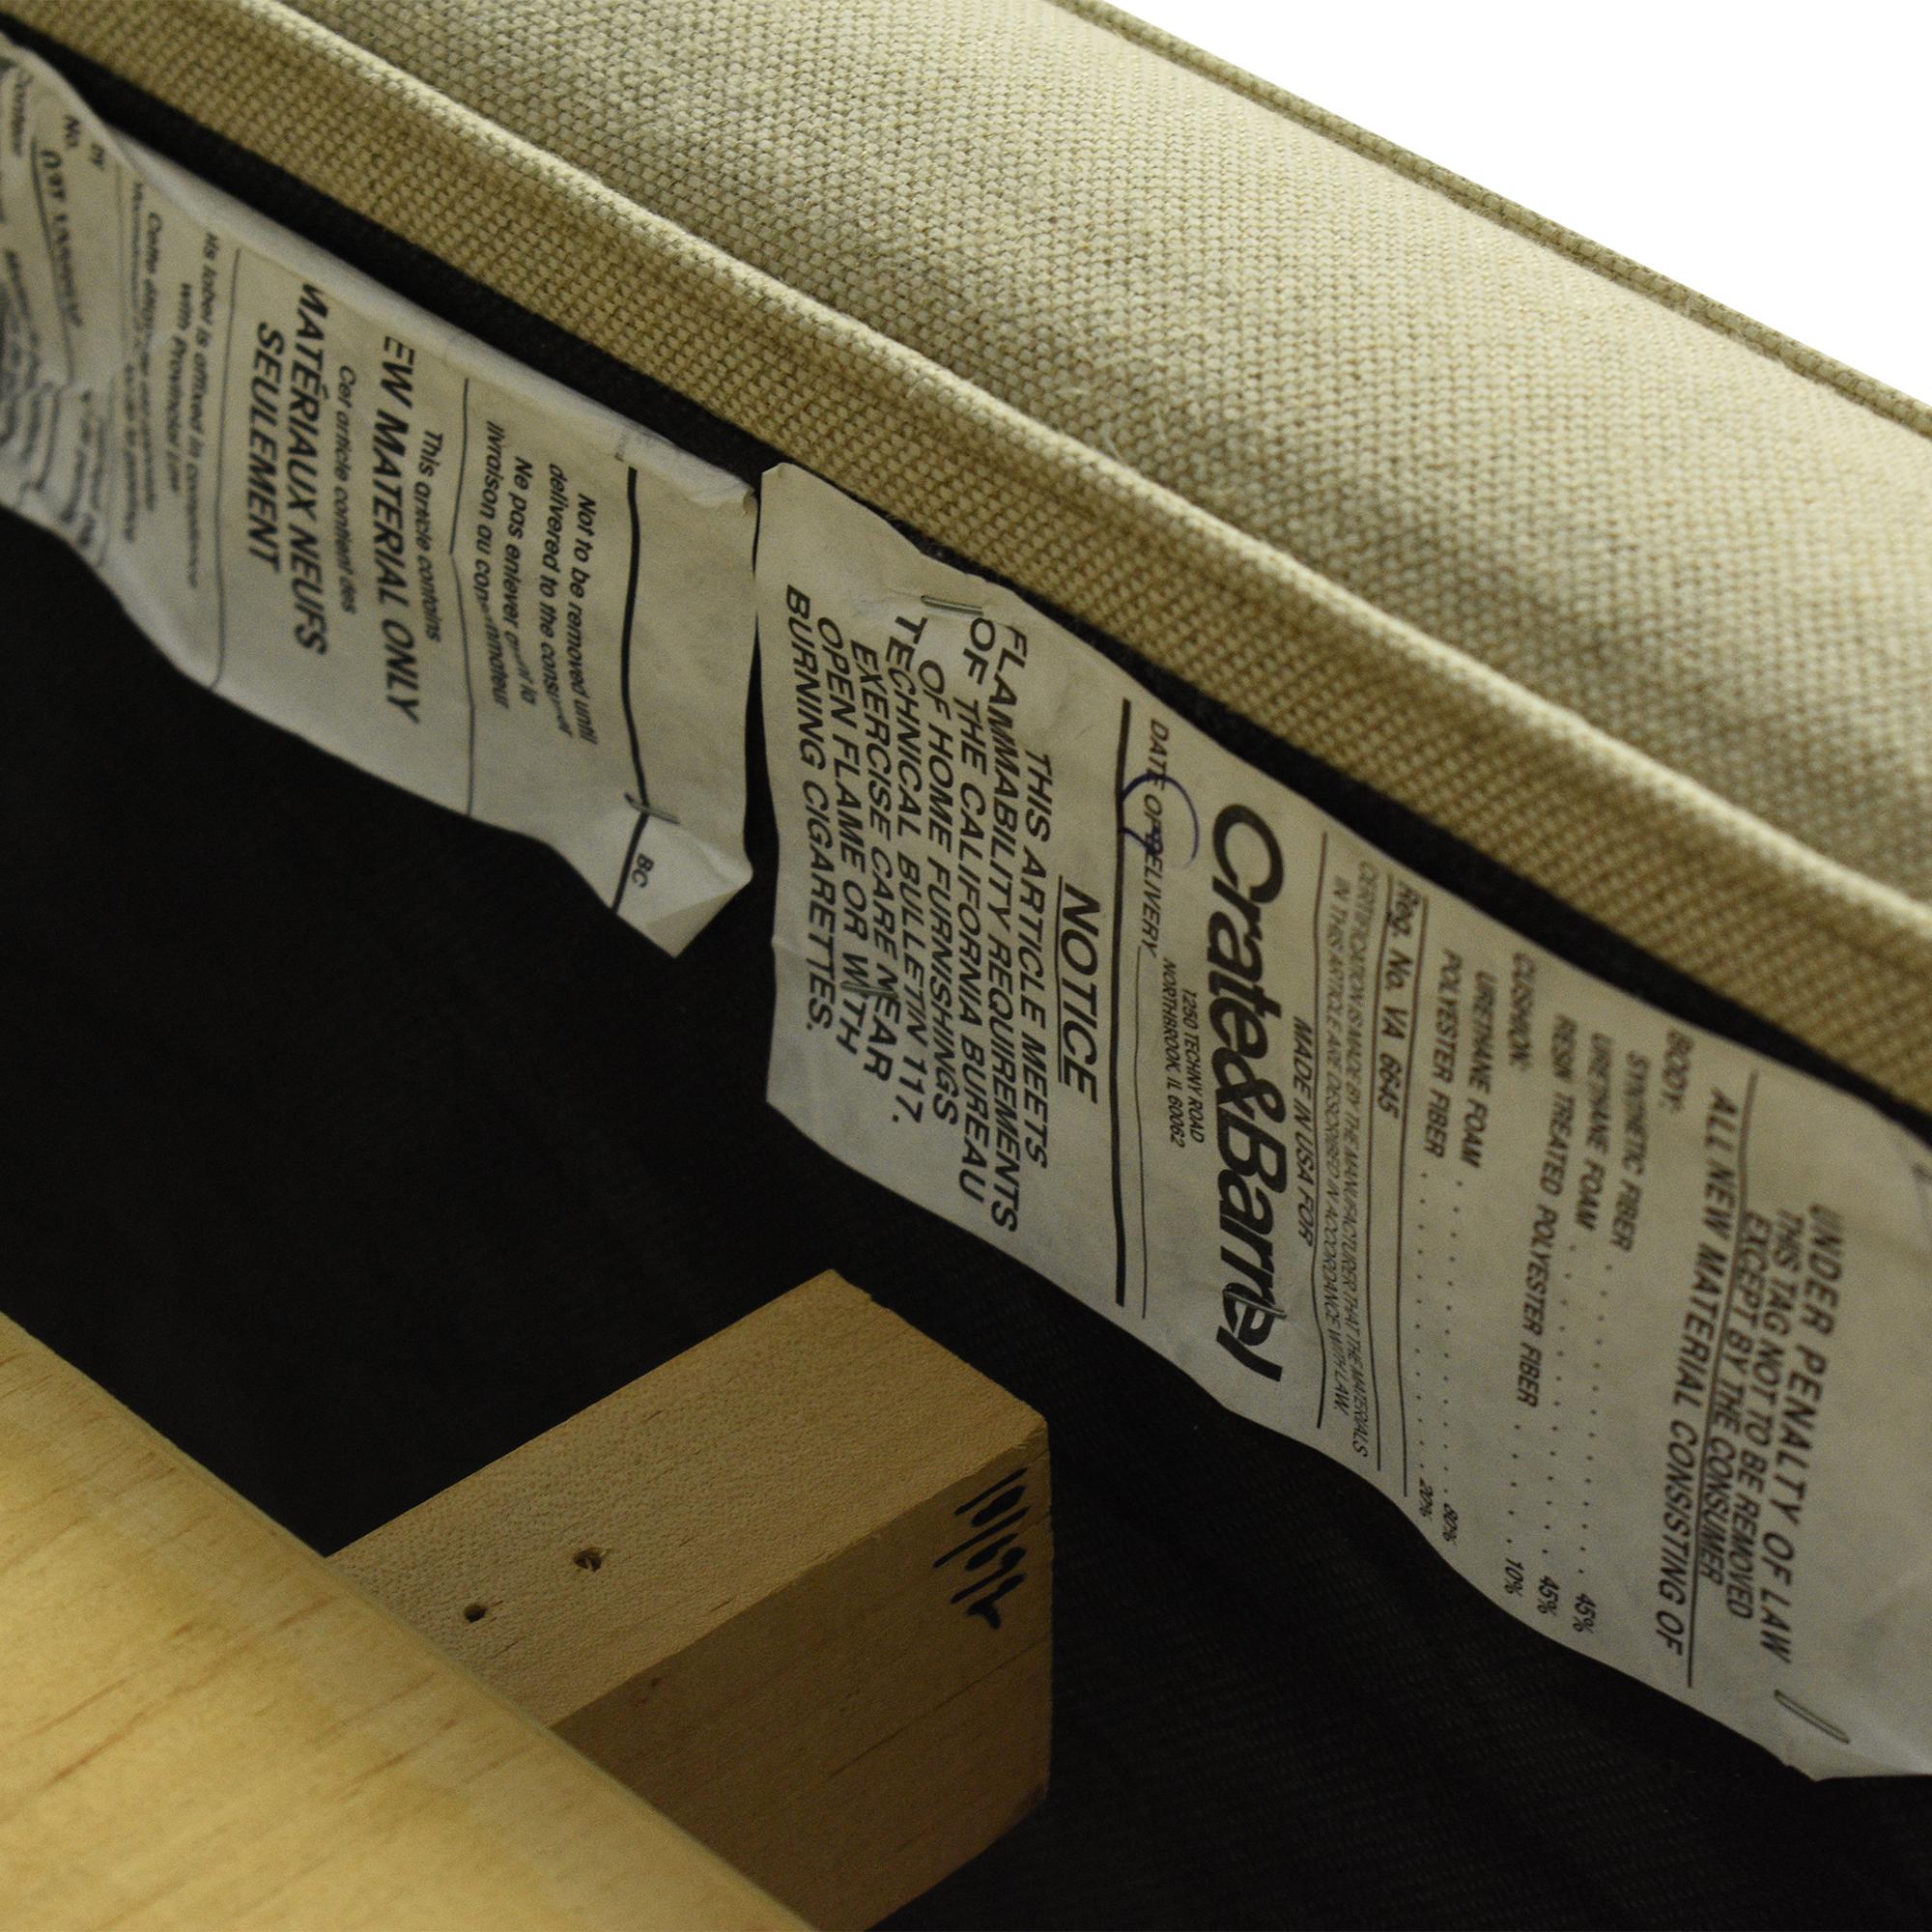 Crate & Barrel Crate & Barrel Colette Upholstered Queen Bed for sale